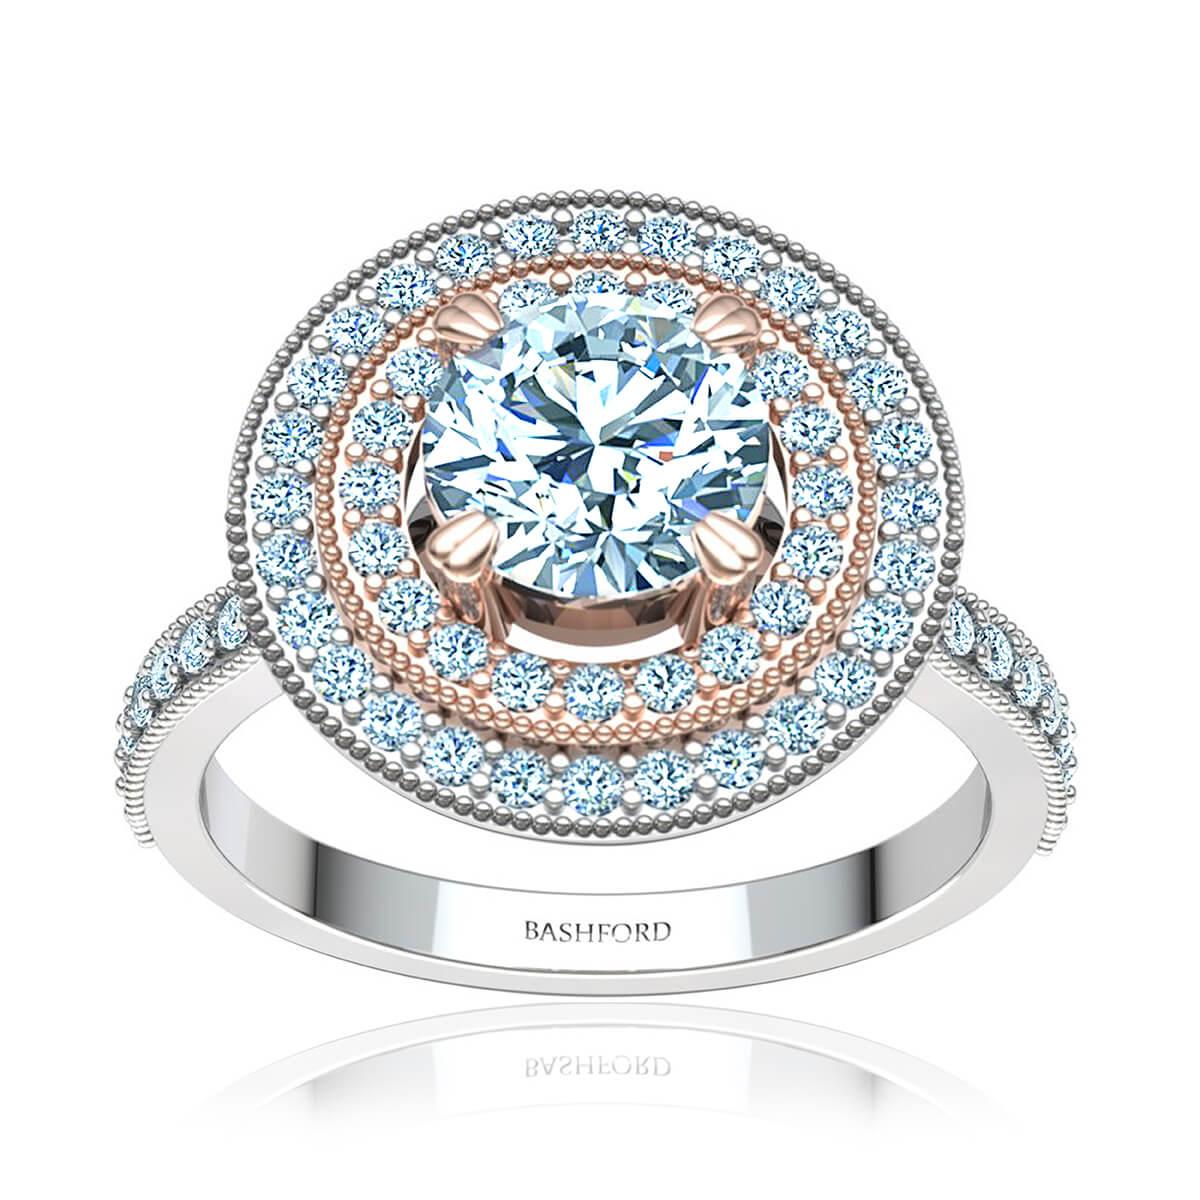 Peach Blossom Diamond Ring (with SI1, F, 1/2 Carat Round Diamond)